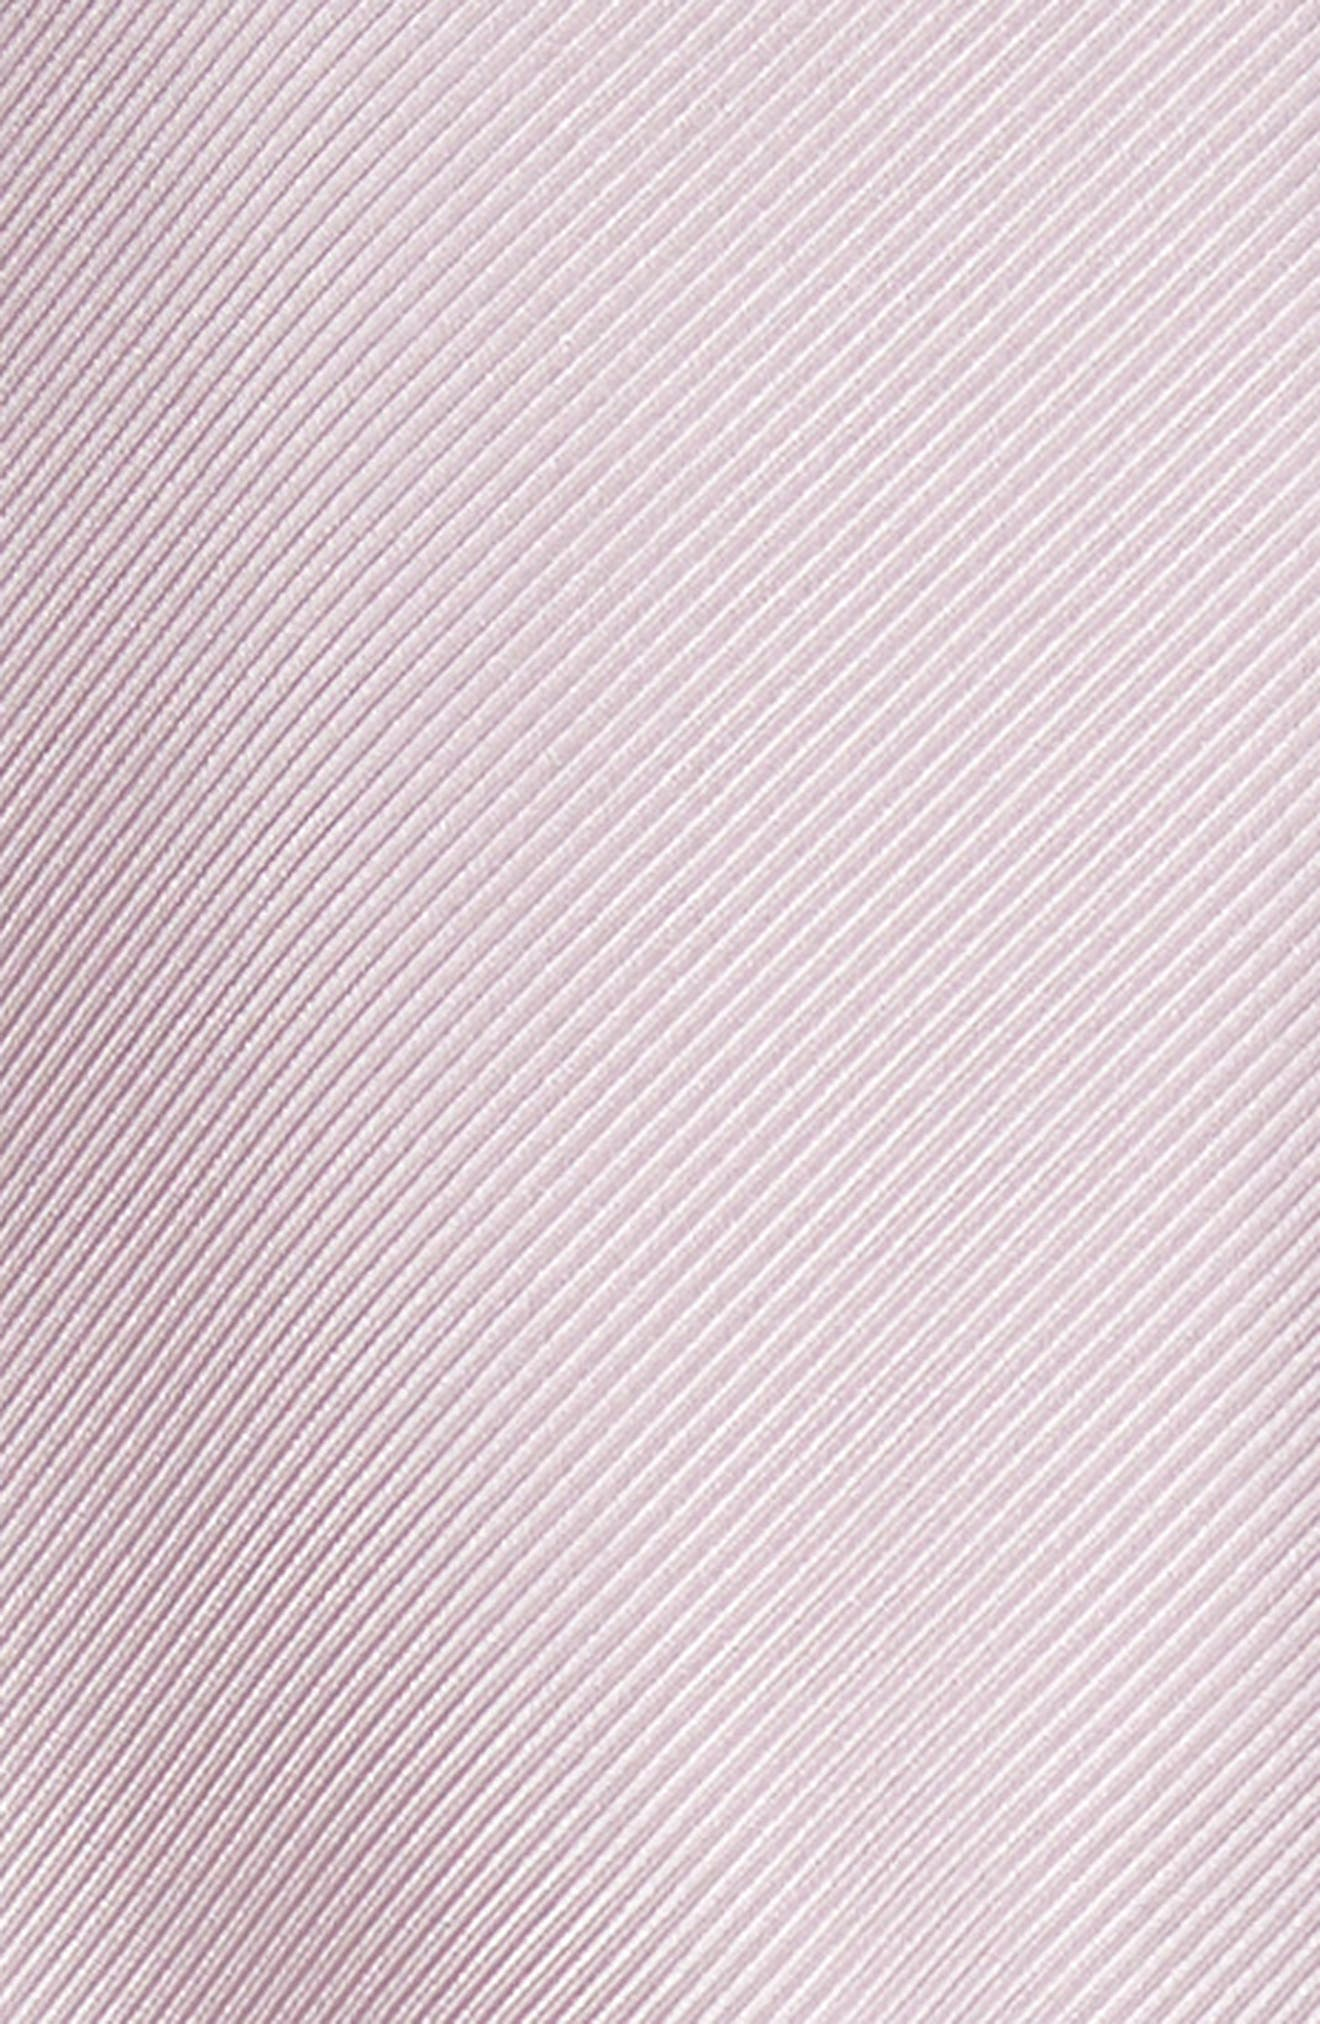 Gather Neck Silk A-Line Dress,                             Alternate thumbnail 5, color,                             664